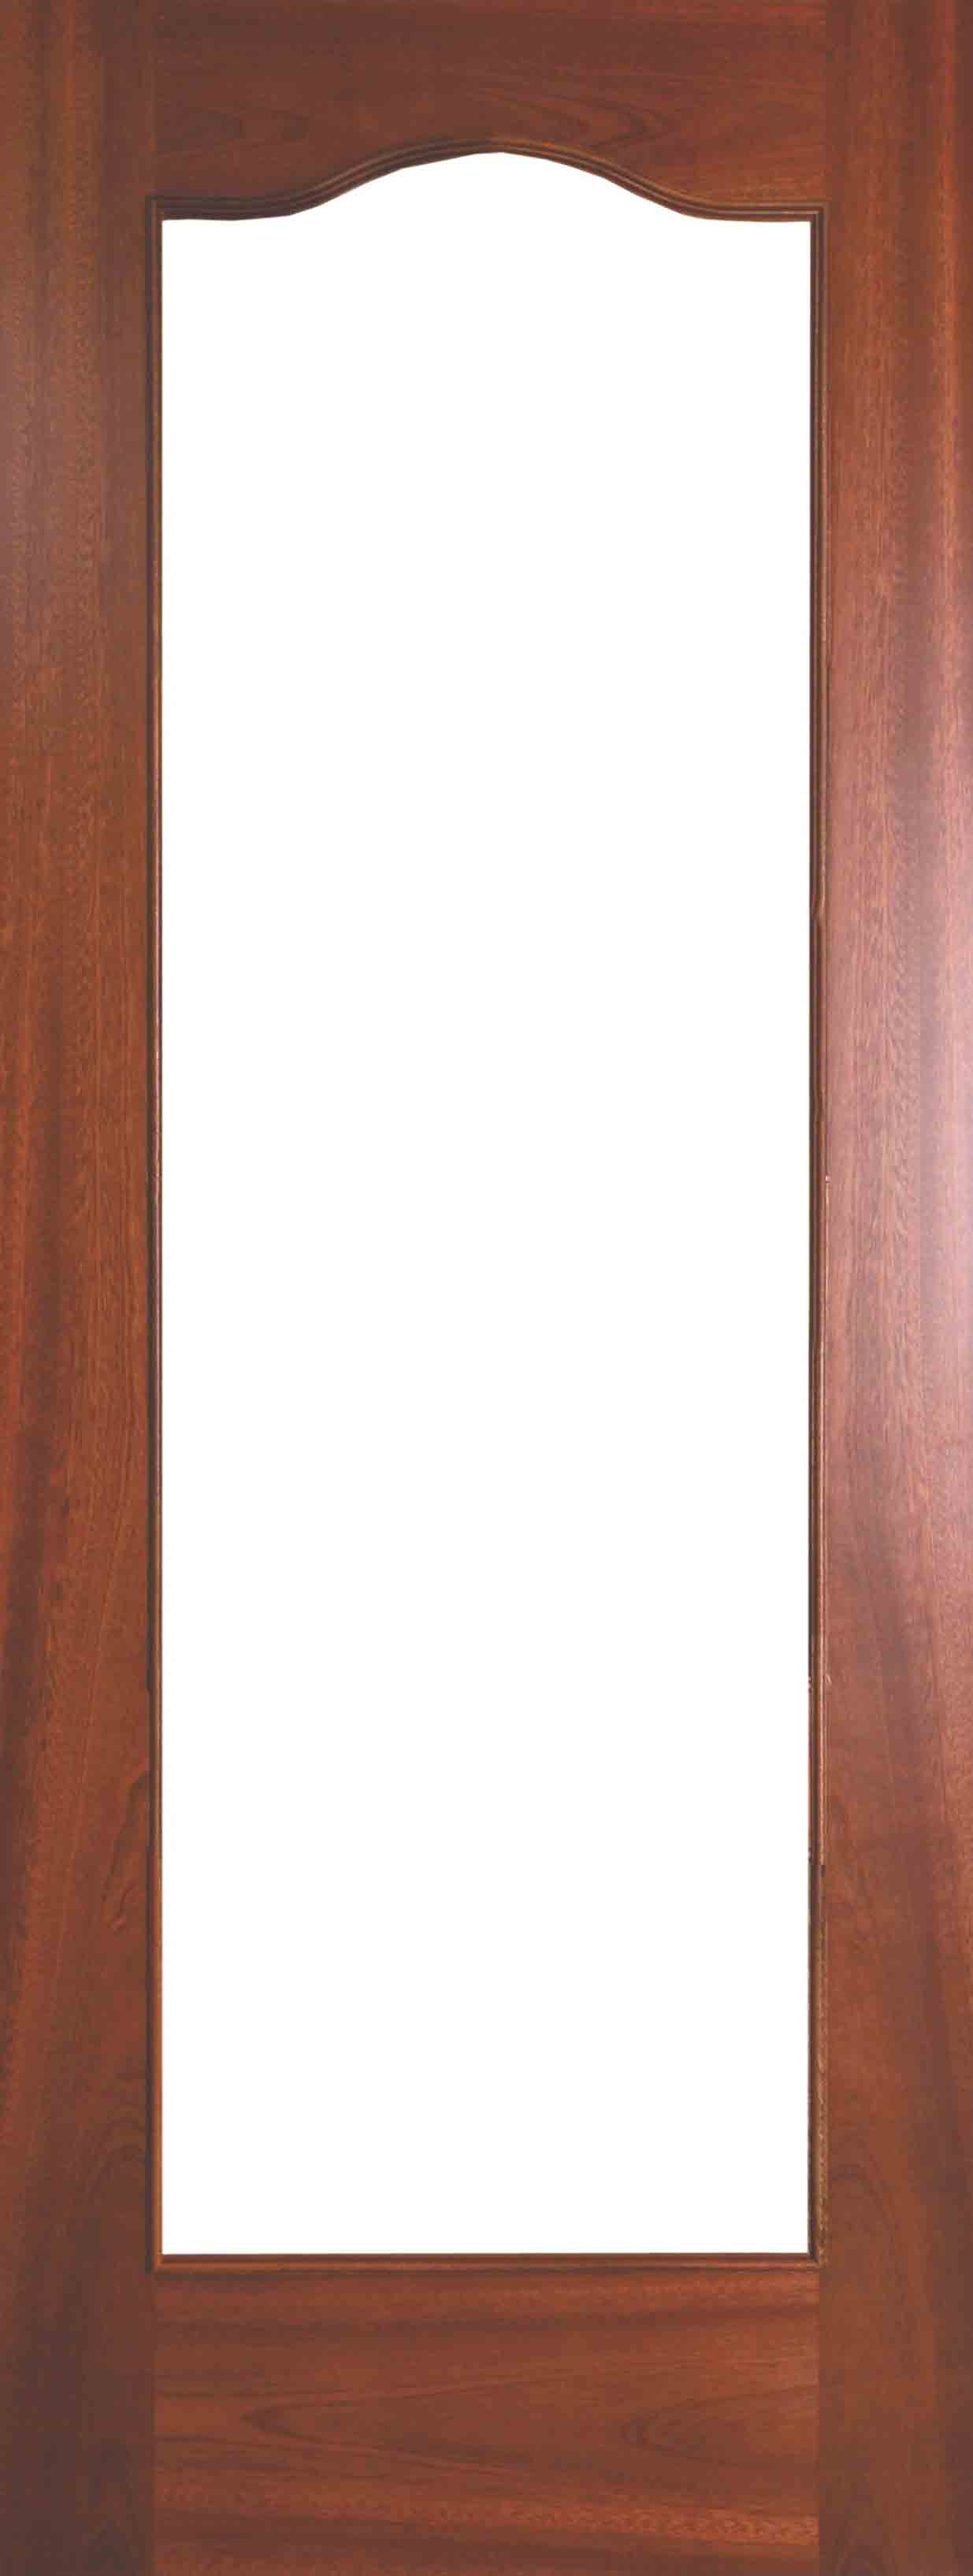 Internal Sapele Cordoba Door Prefinished with Clear Flat Glass